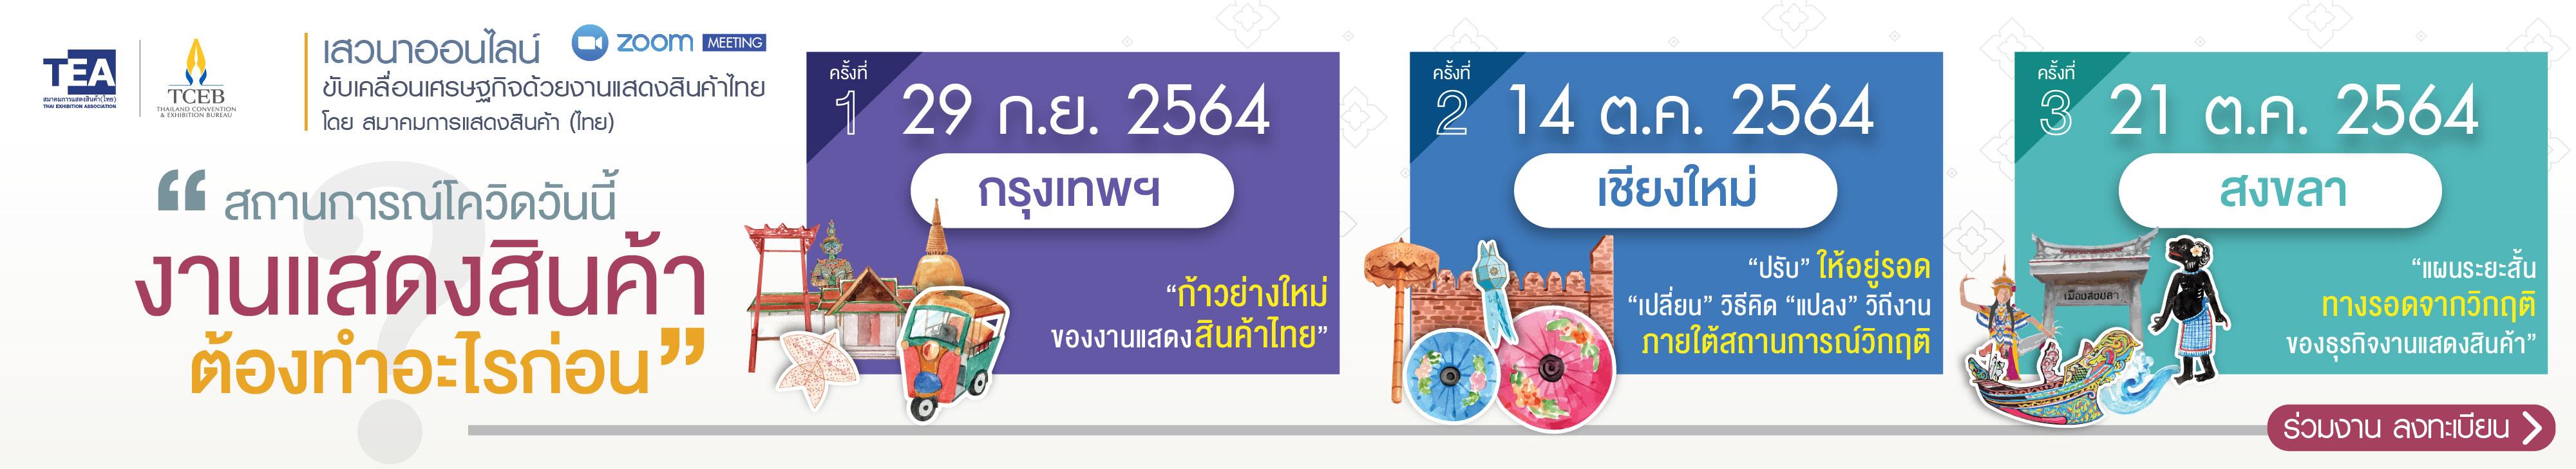 Banner-Web1-01.jpg